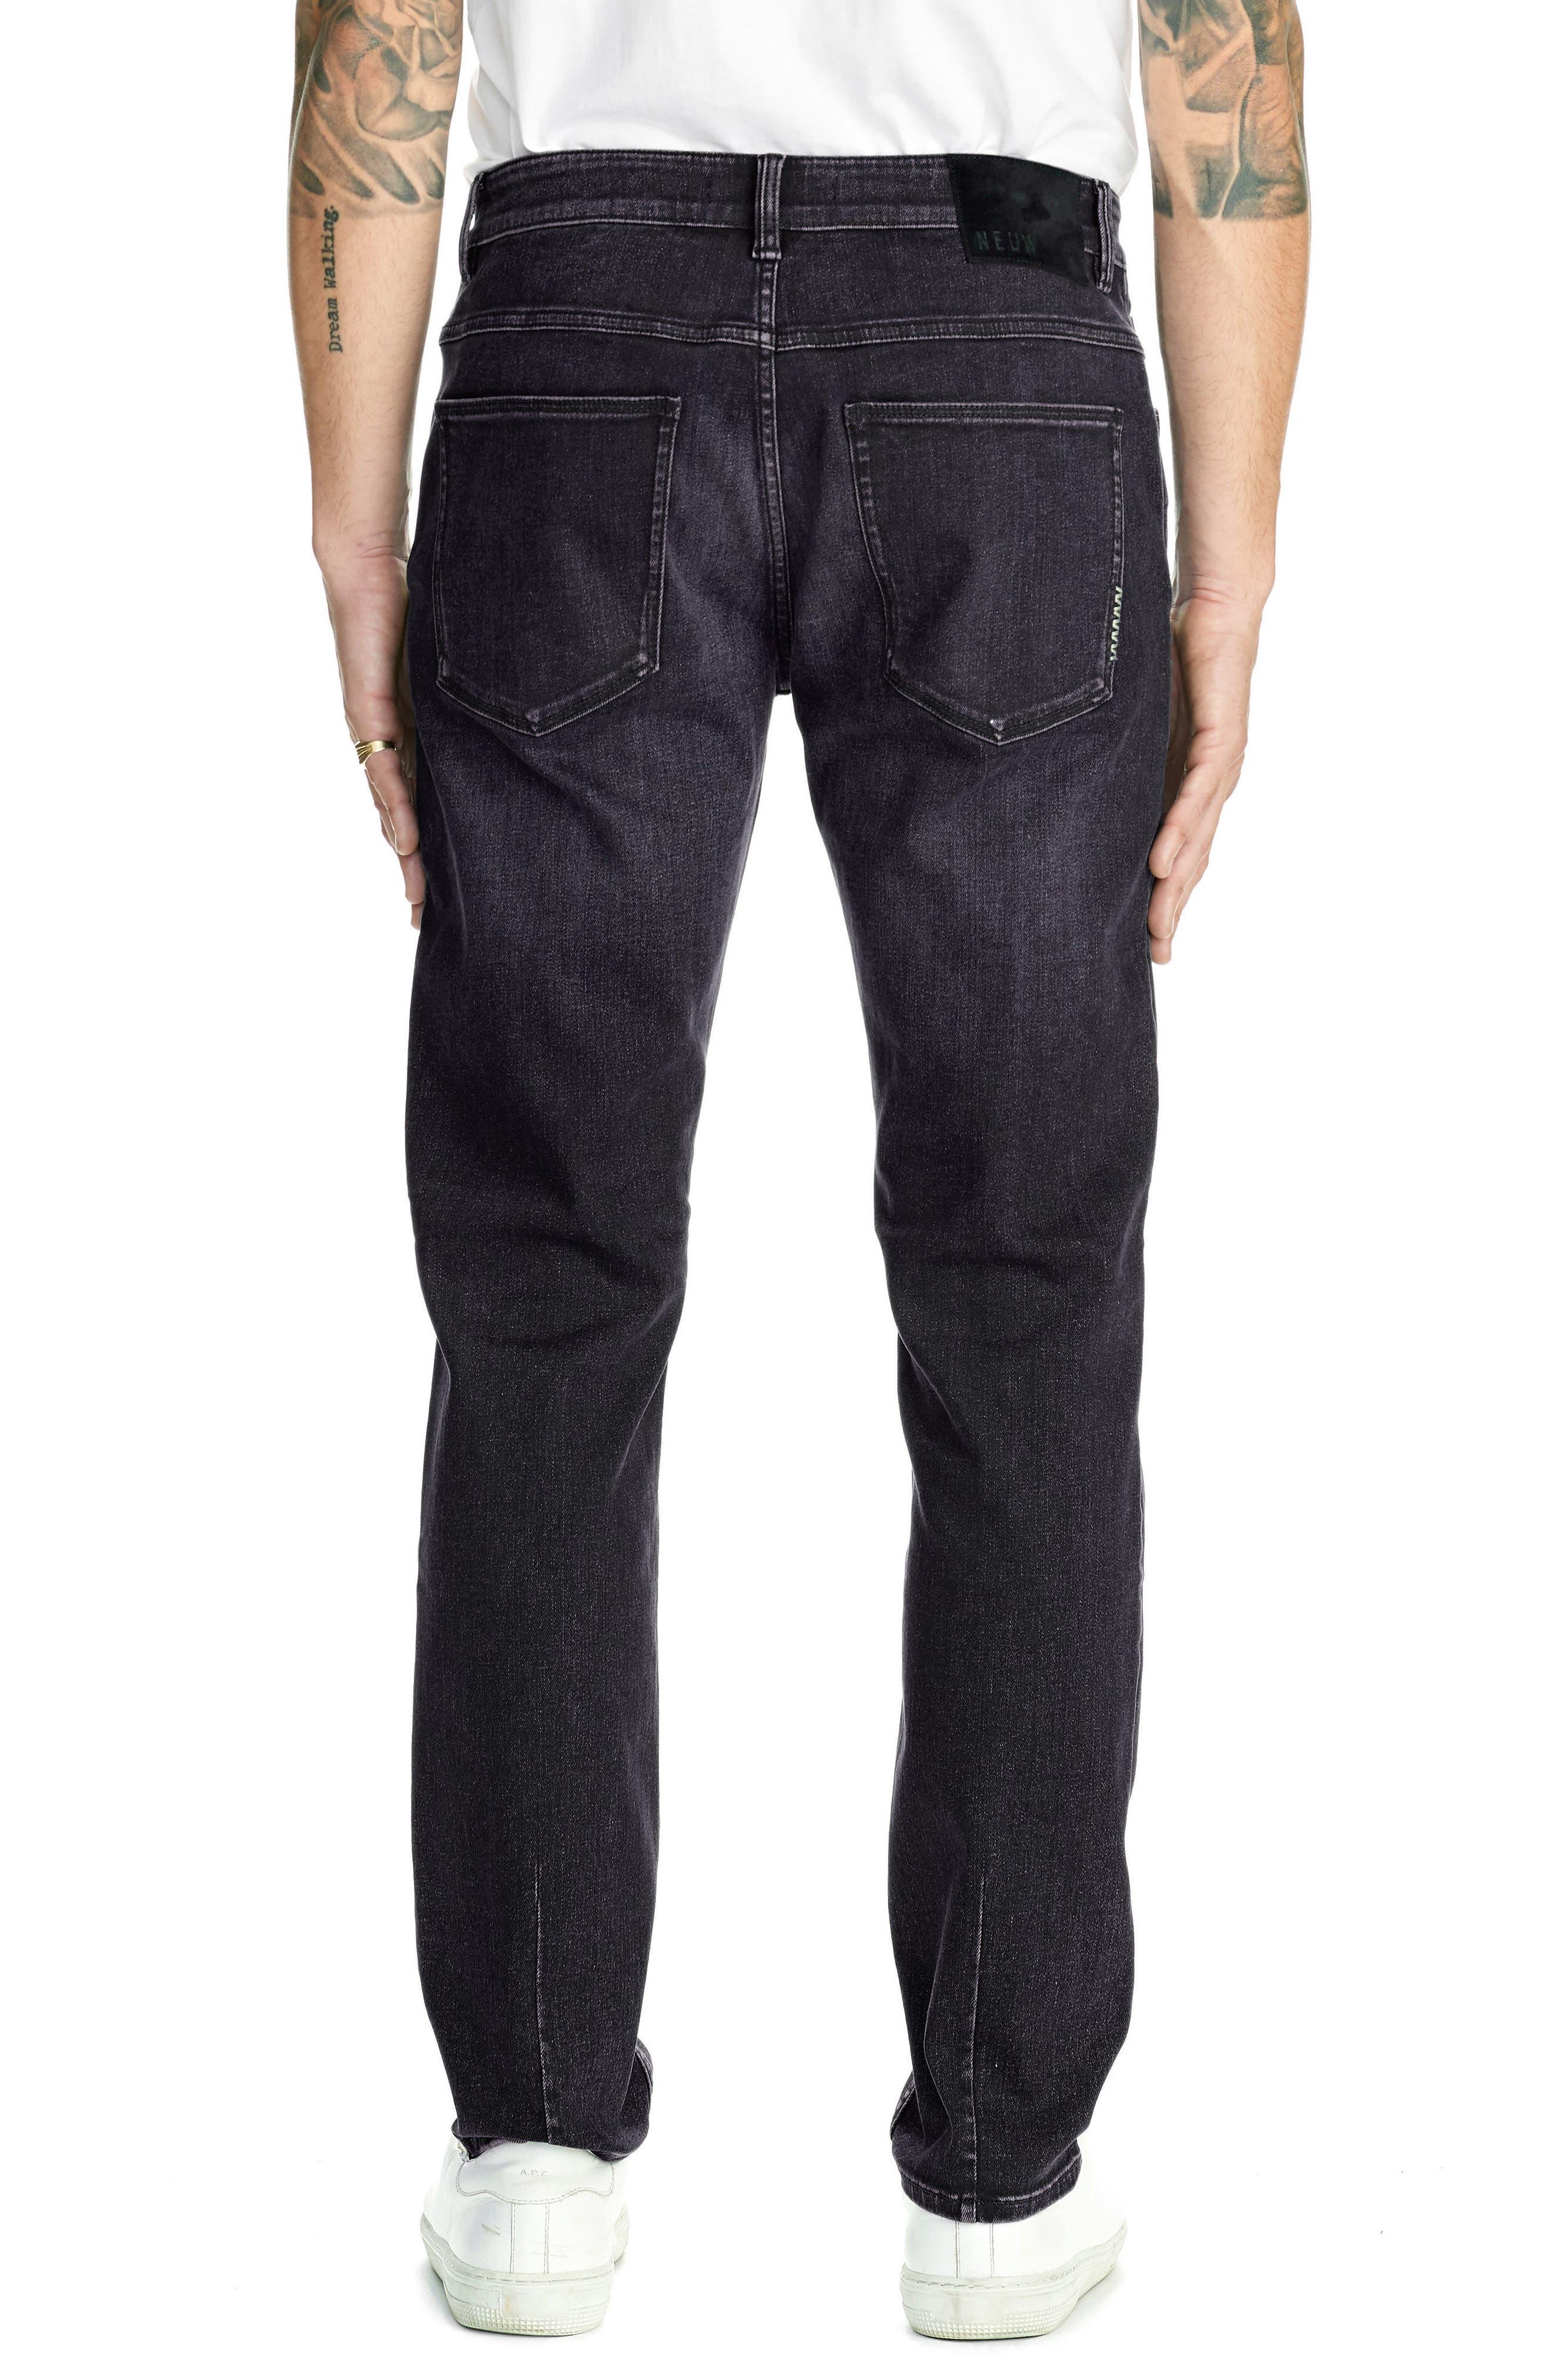 Lou Slim Fit Jeans,                             Alternate thumbnail 2, color,                             Sthlm Modern